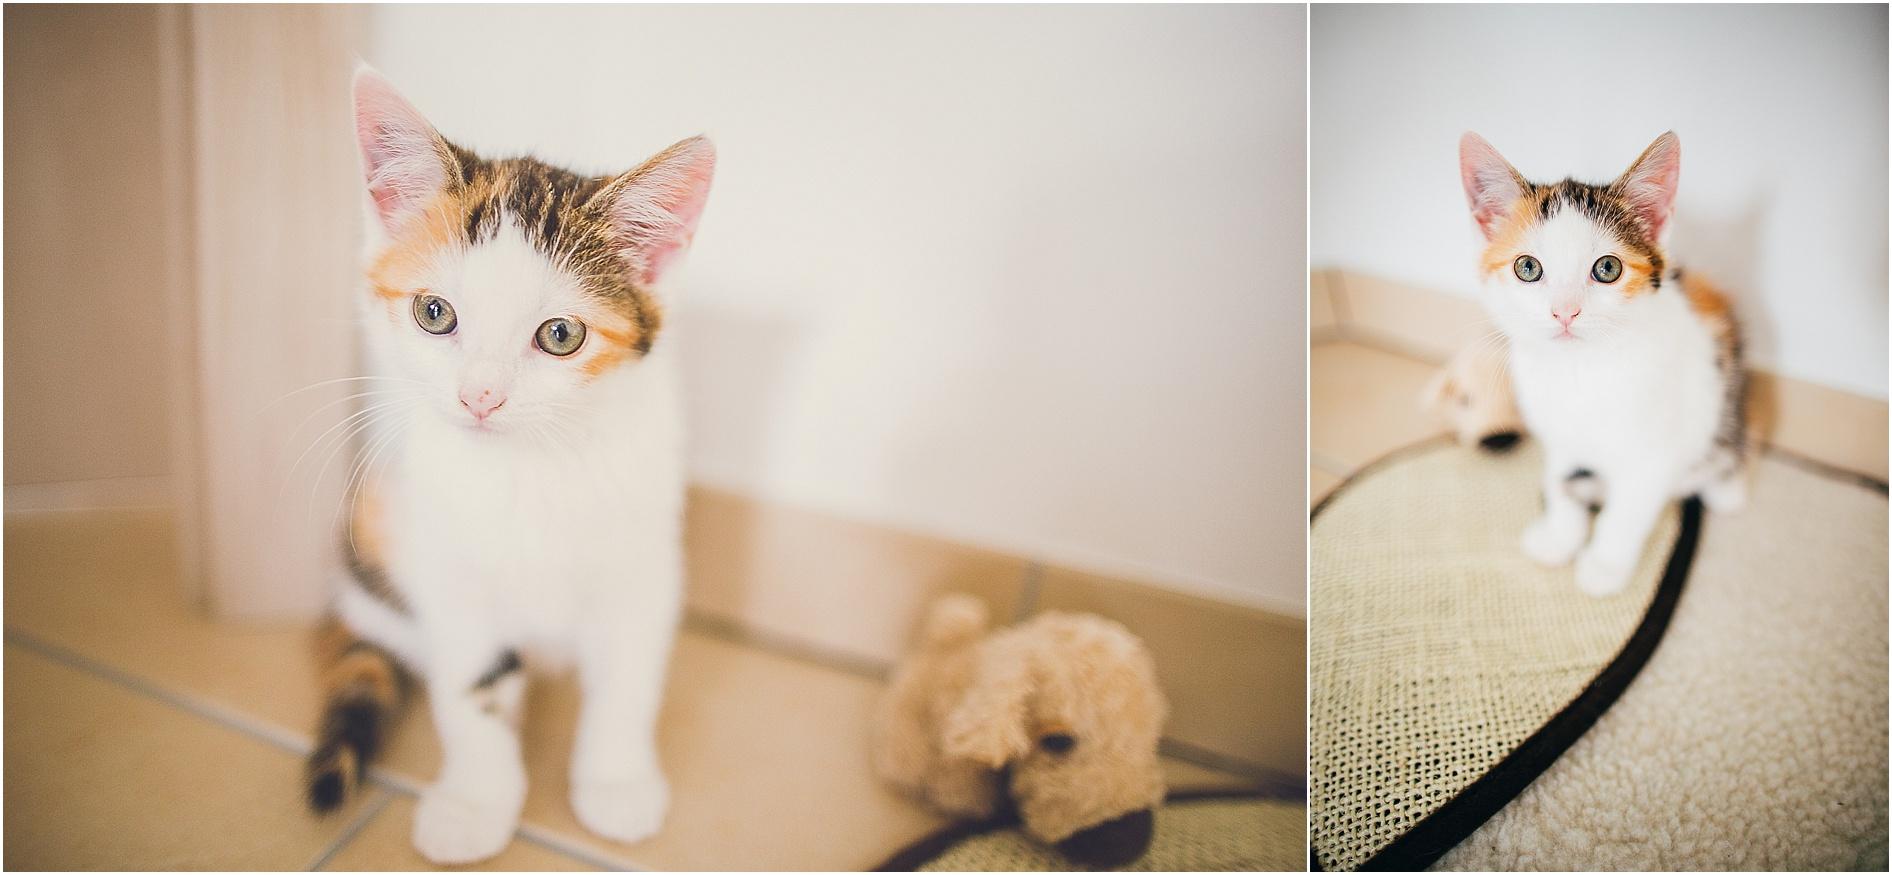 2014-07-23_0006 Paula & Frieda, zwei bezaubernde Kitten